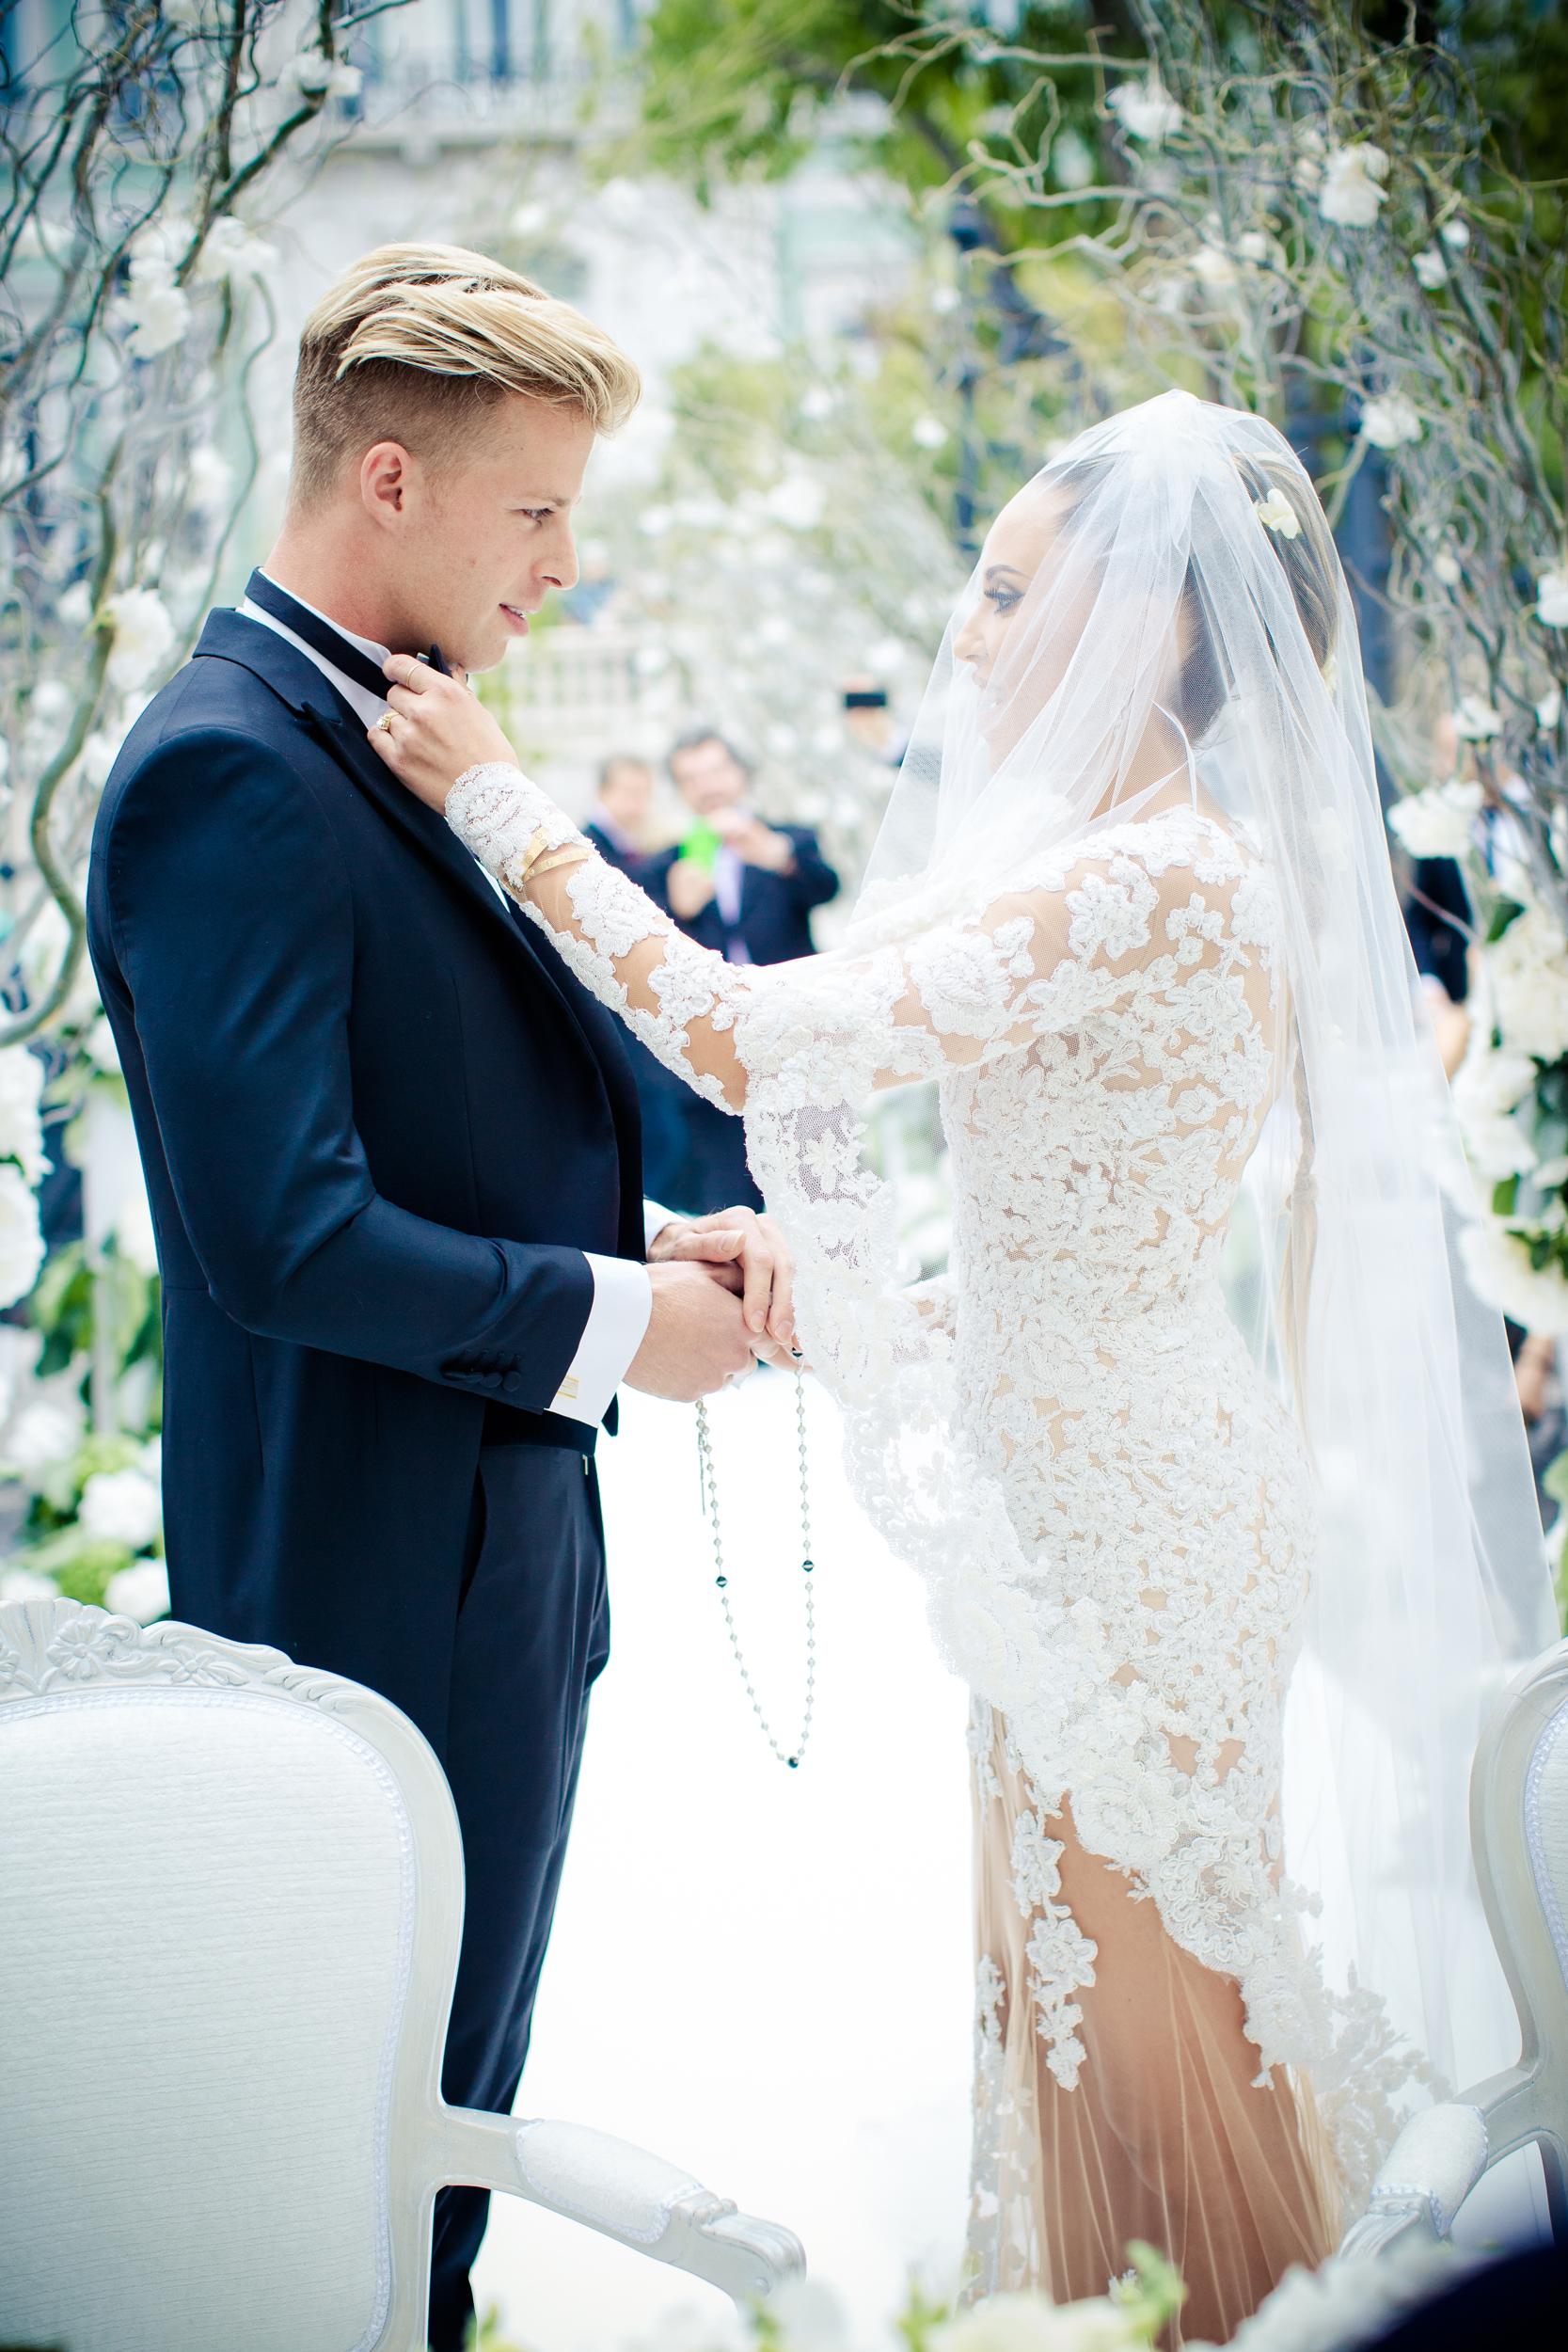 Andrea & Ilan | Wedding | Isabel Saldanha Photography_140